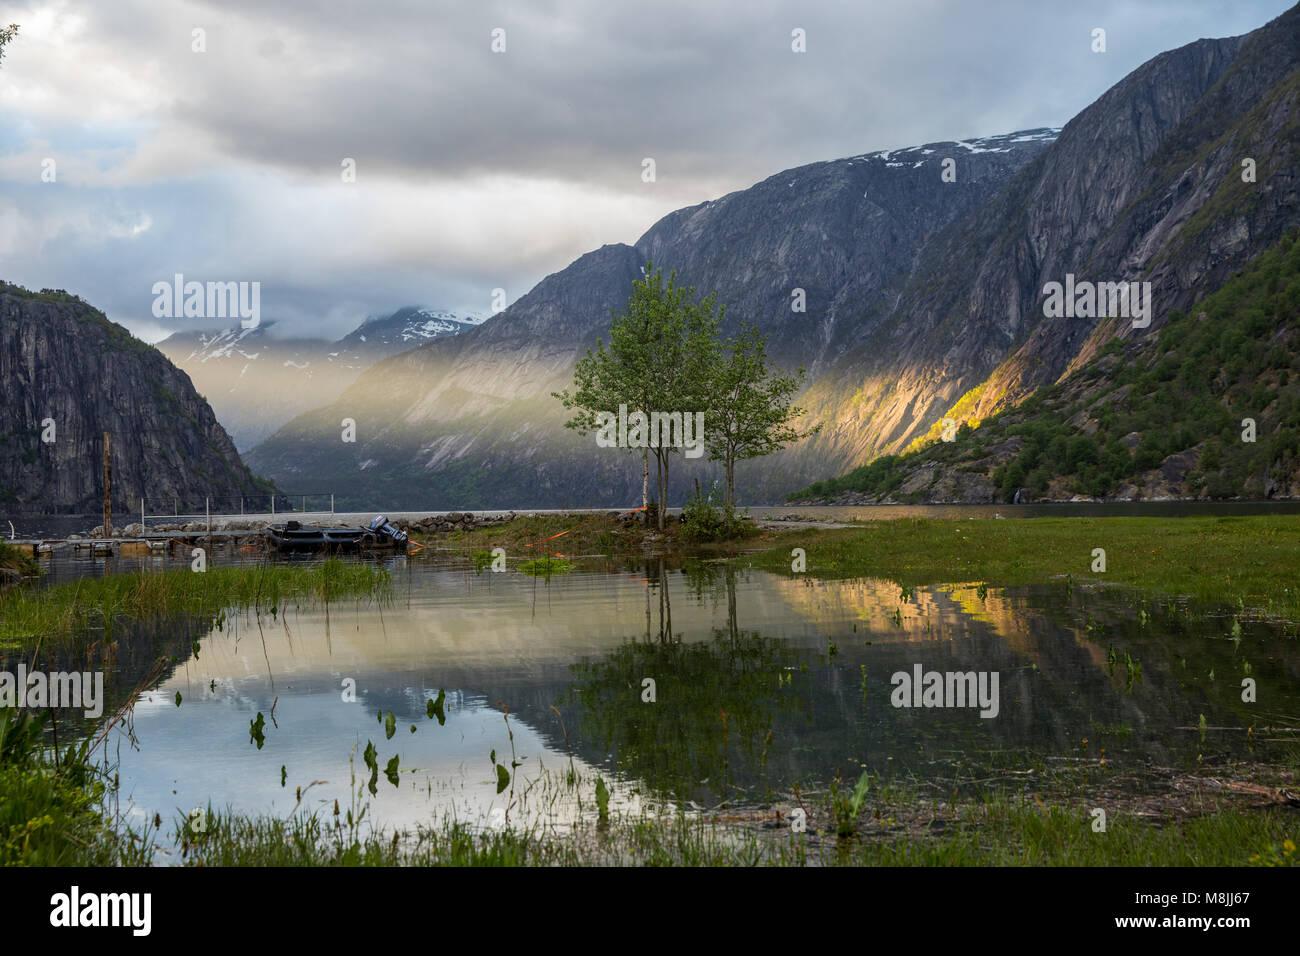 Sunset am Eidfjord - Stock Image